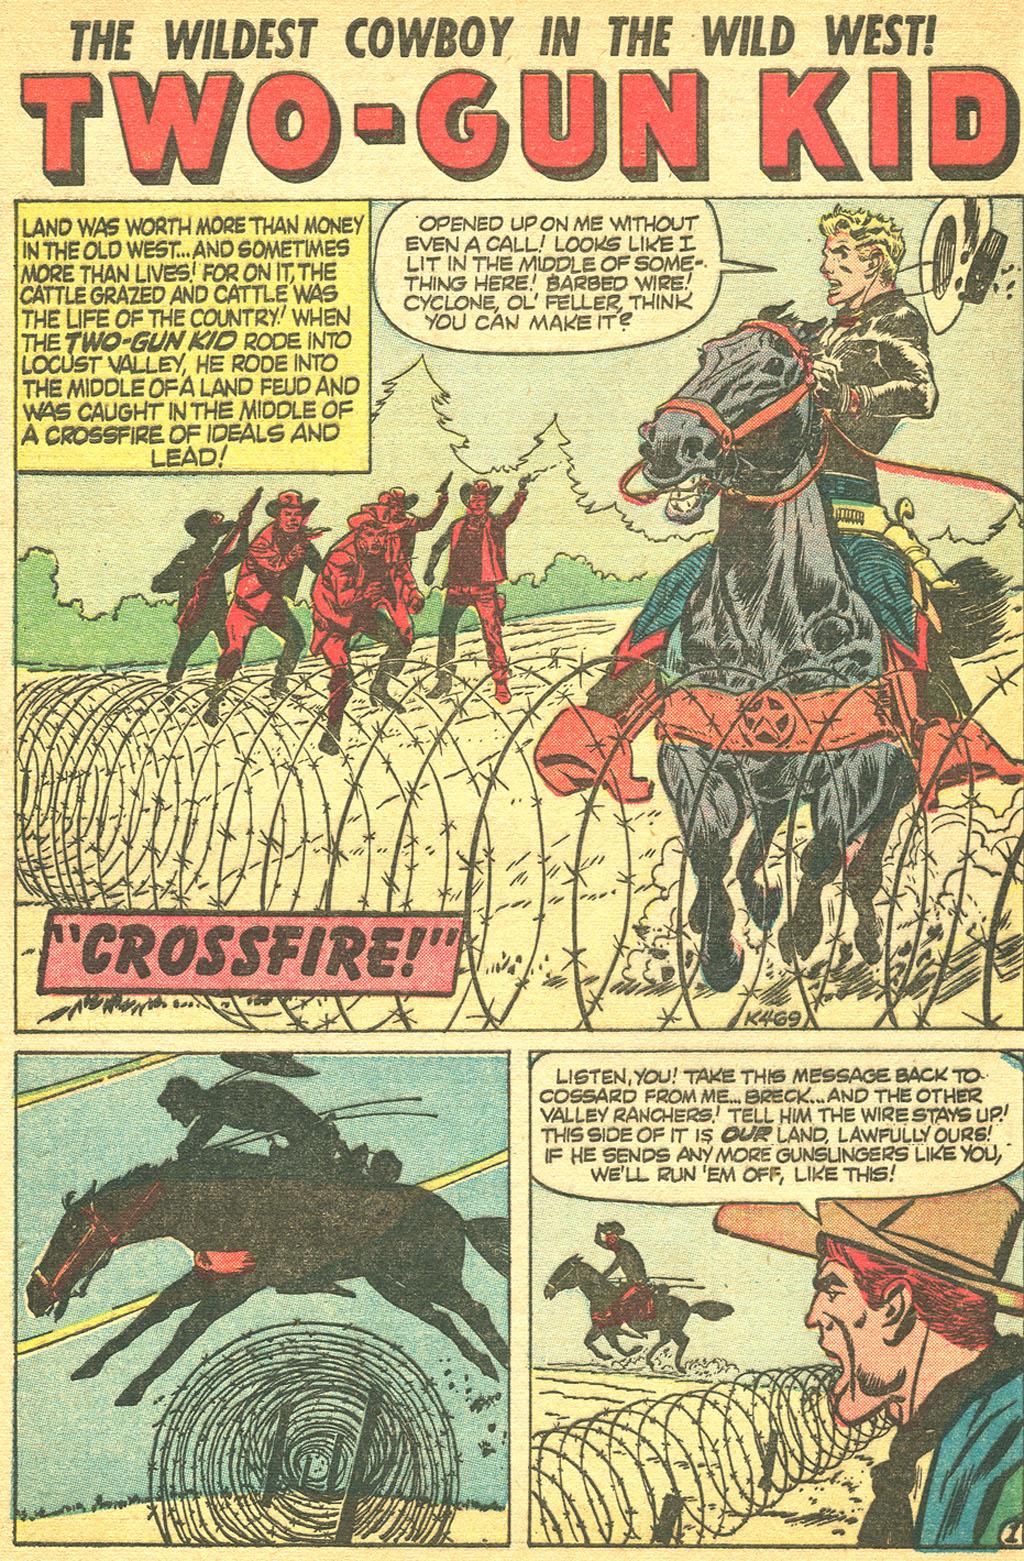 Read online Two-Gun Kid comic -  Issue #34 - 27